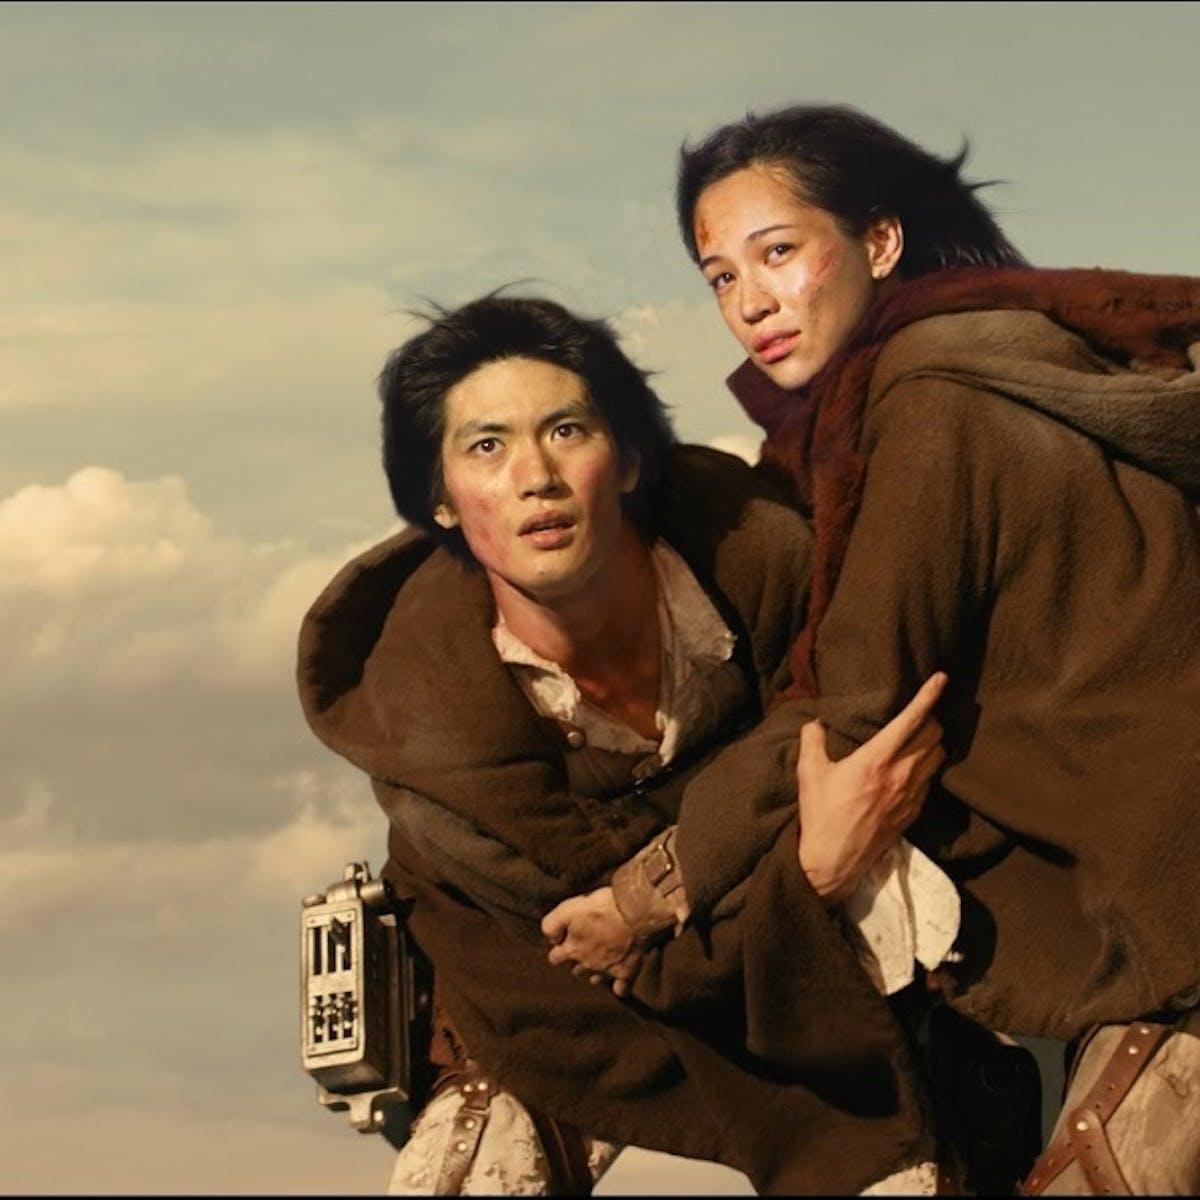 attack on titan movie download english dub